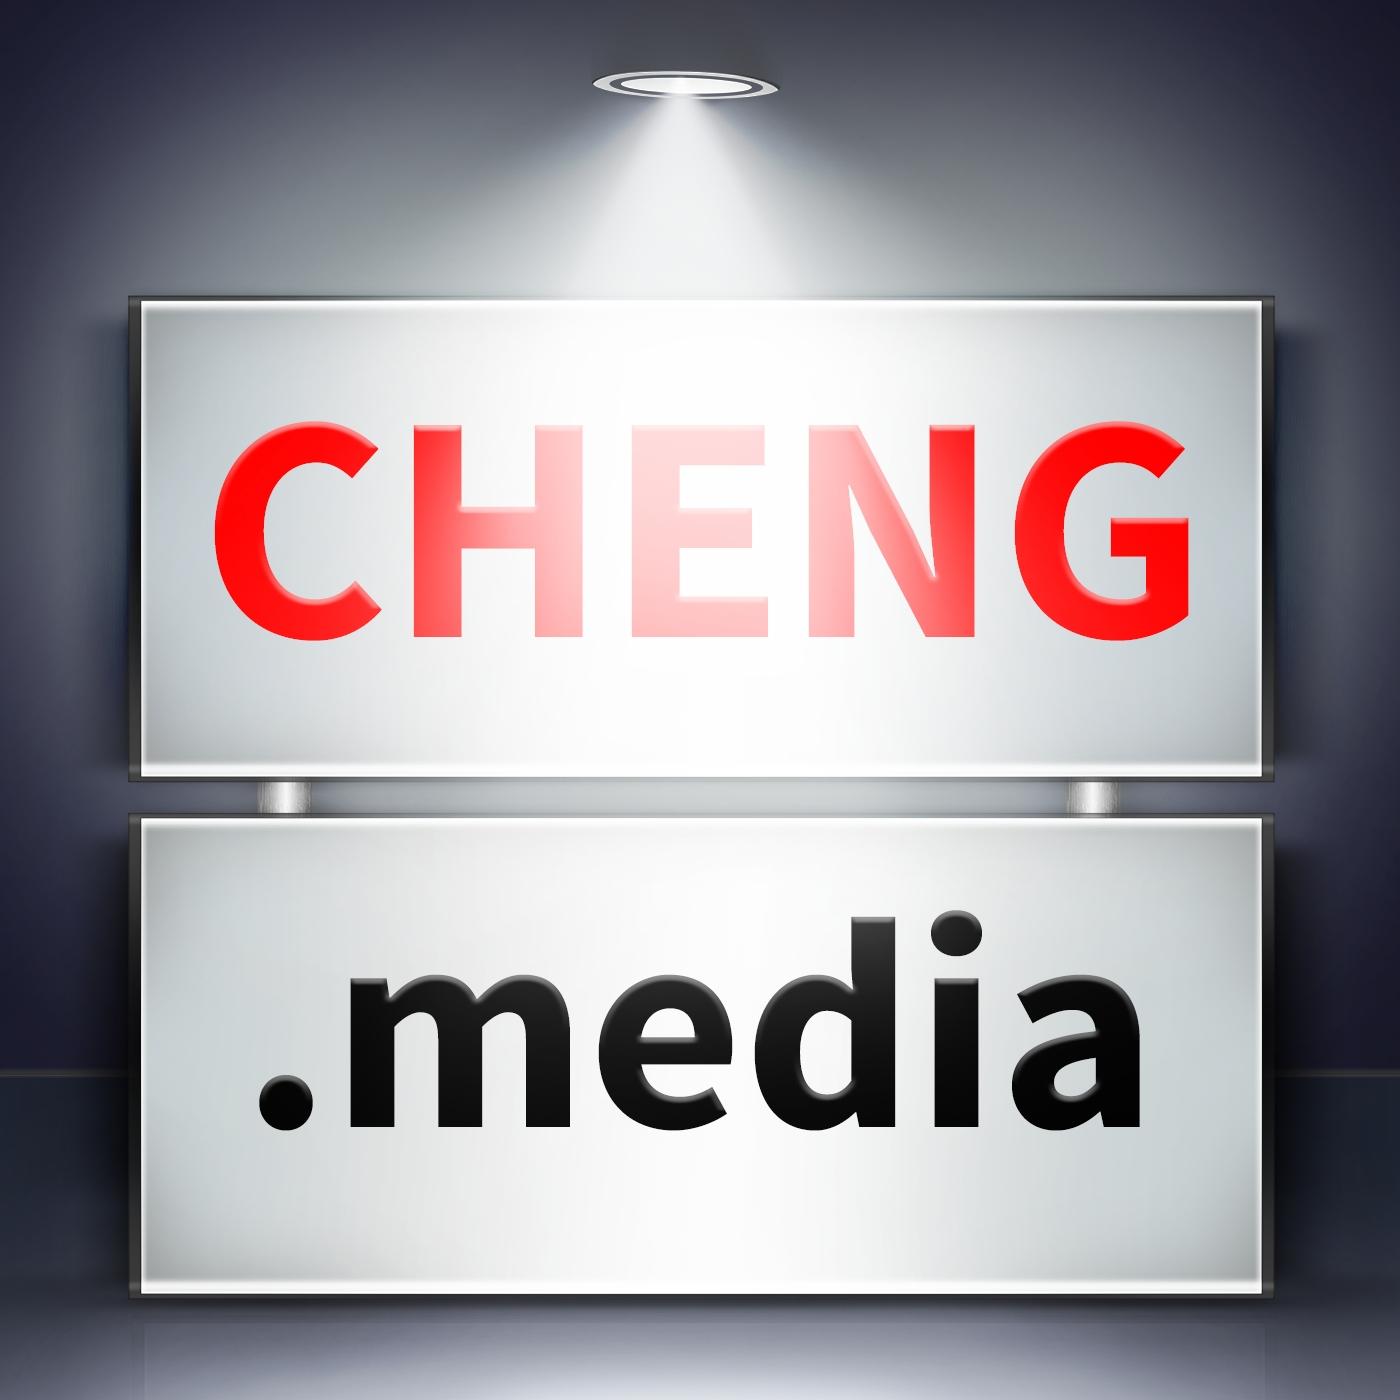 CHENG MEDIA SERVICES LLC